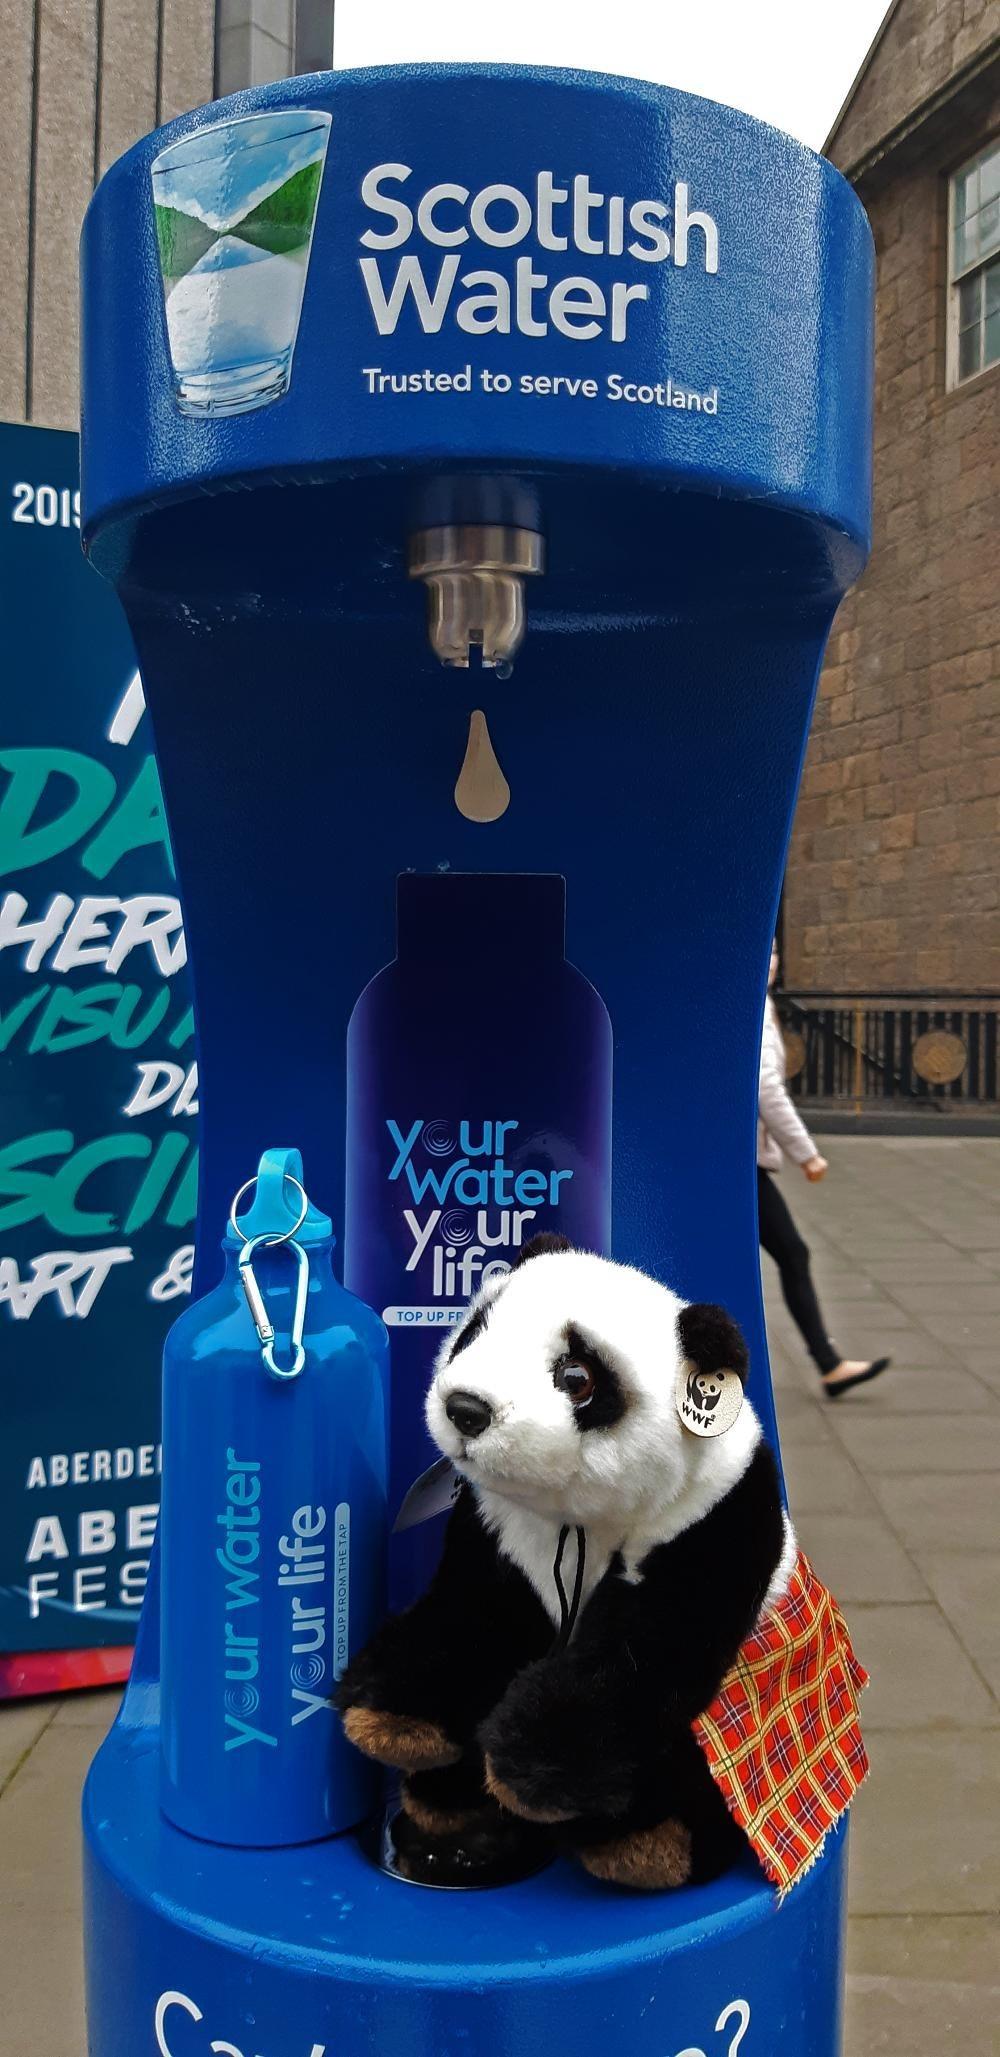 New blue outdoor bottle refill station in Aberdeen city centre